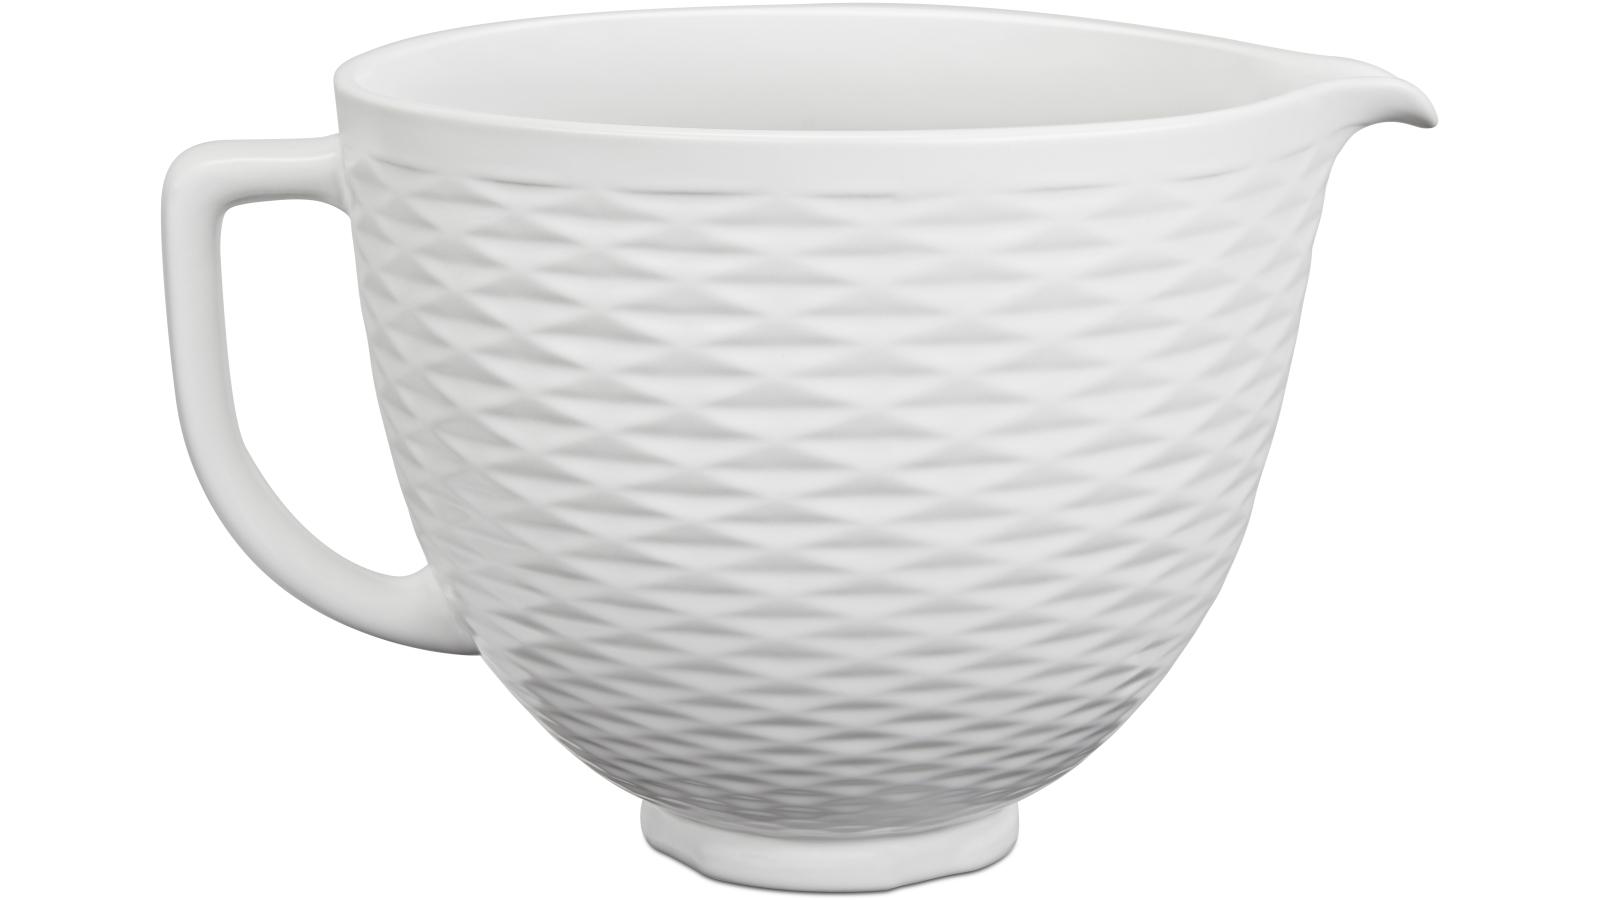 Image of KitchenAid Embossed White Chocolate Ceramic Bowl Stand Mixer Accessory